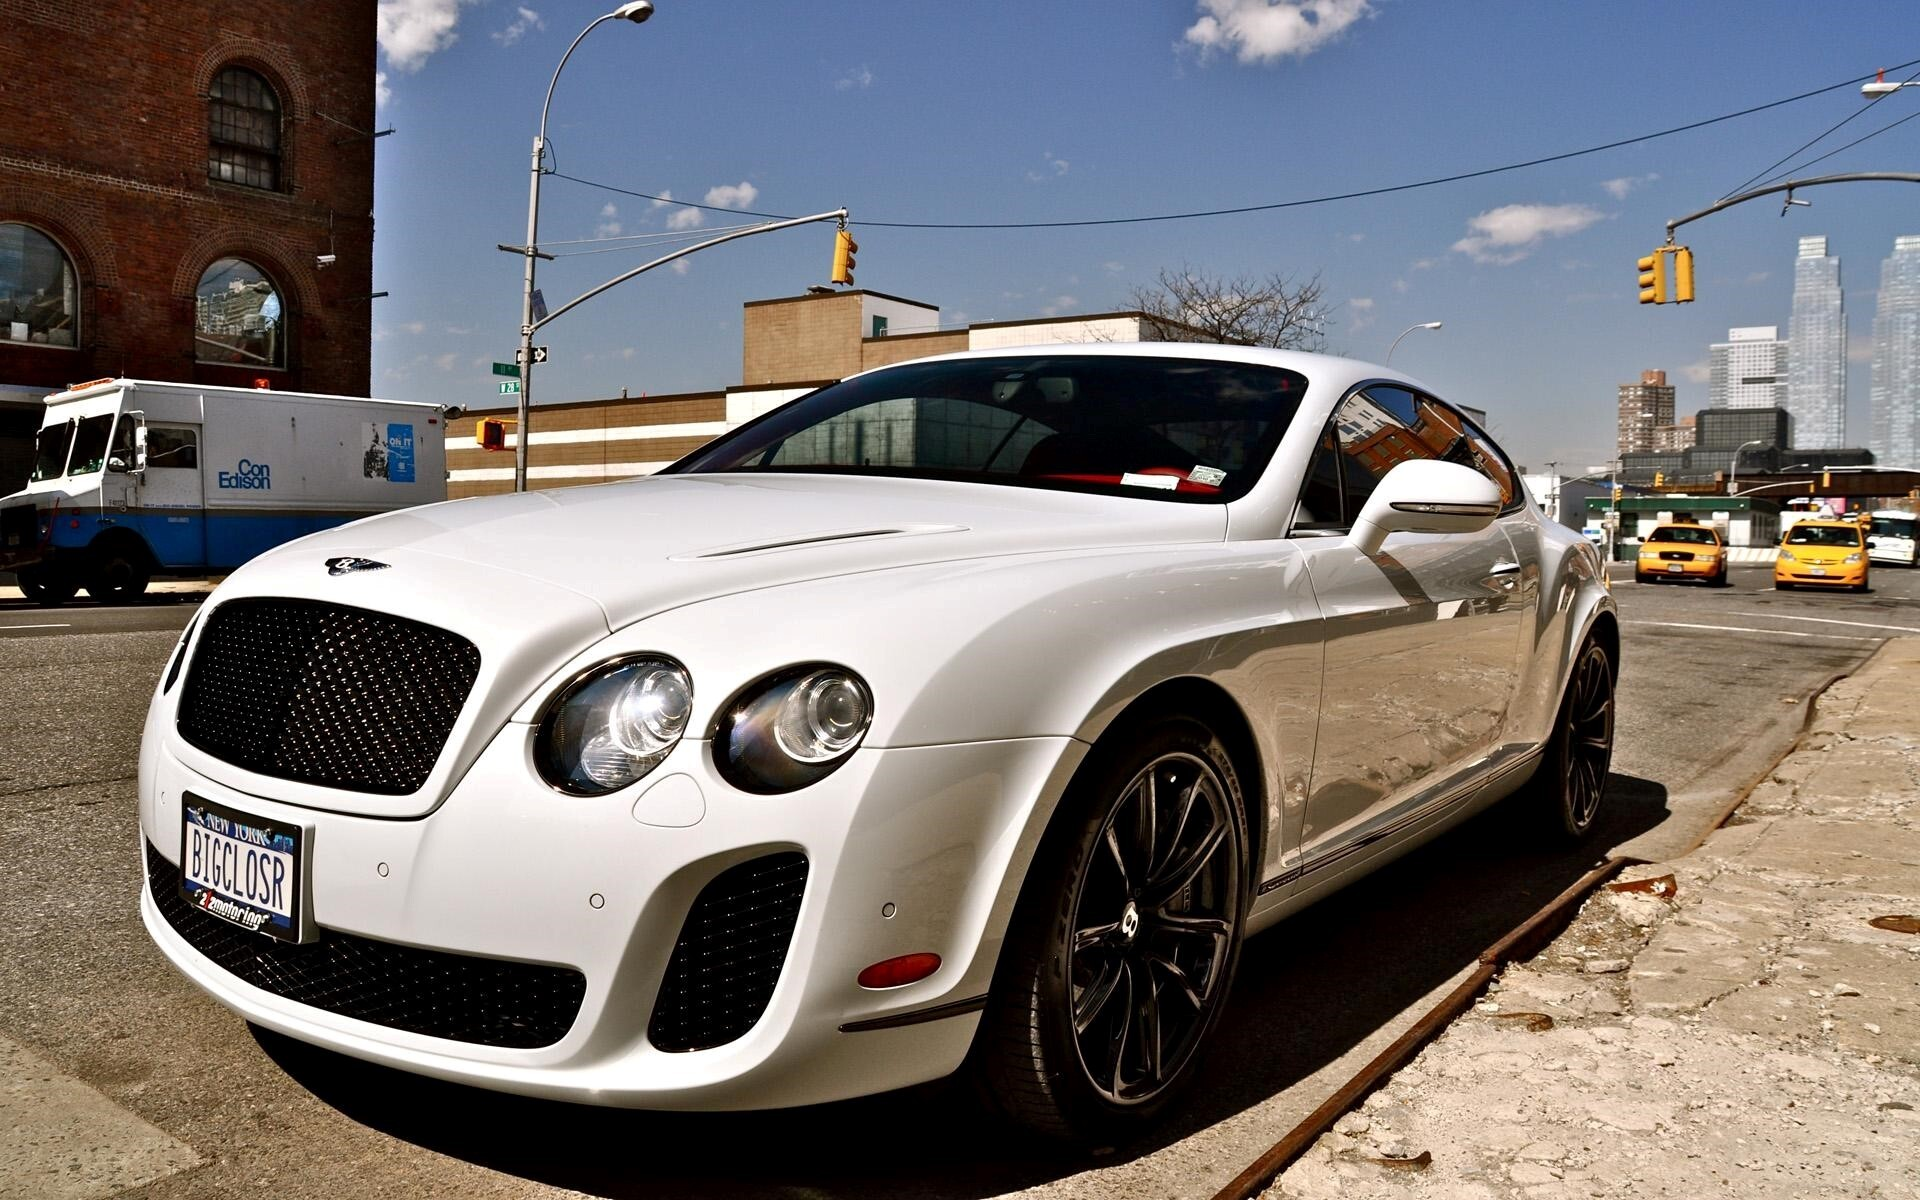 White Bentley Car Wallpaper Hd Wallpapers